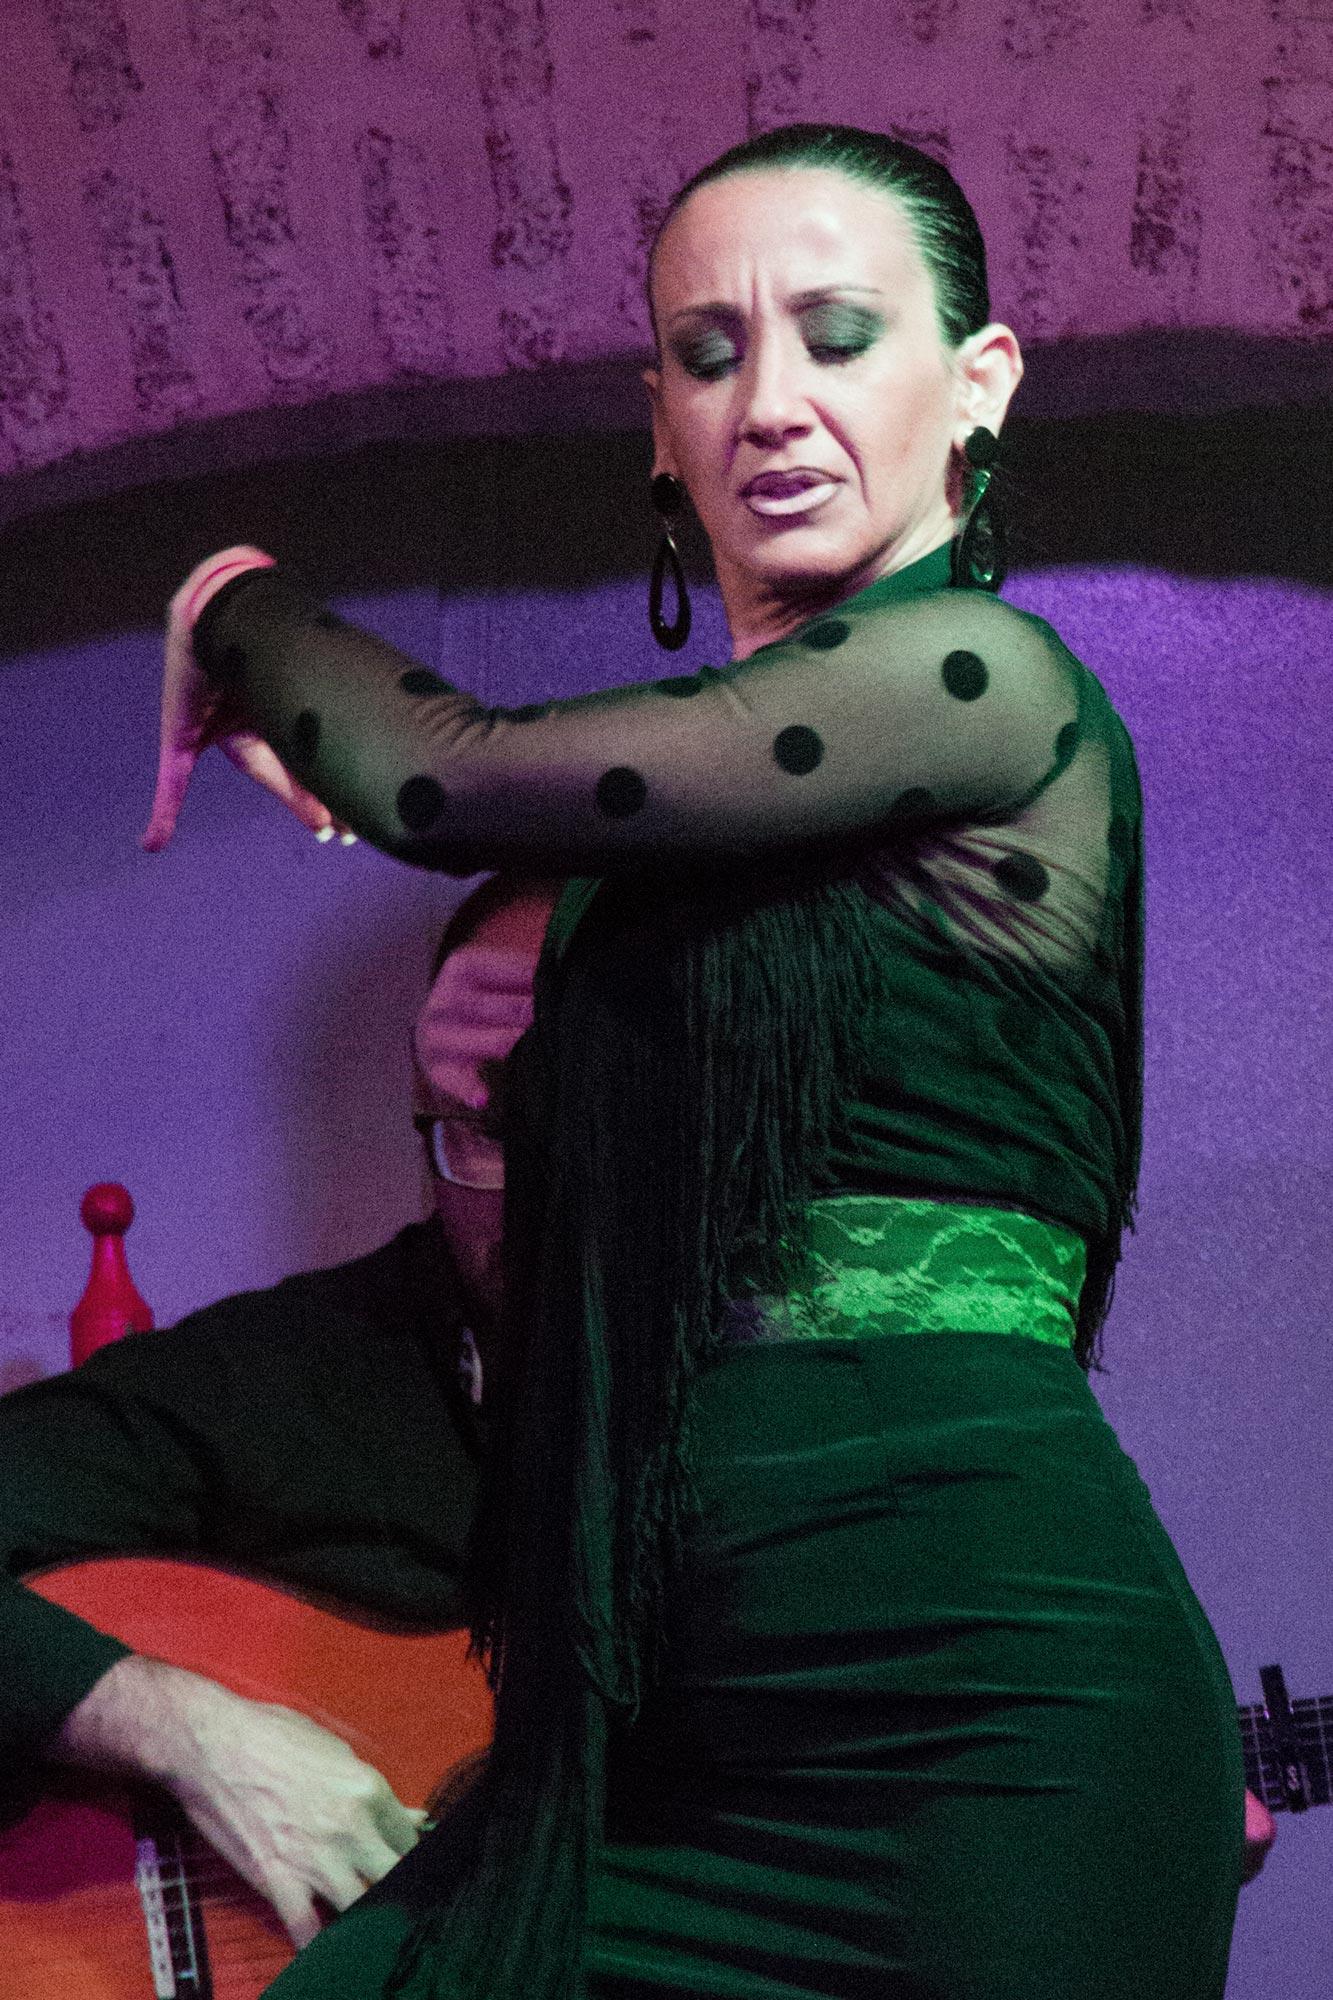 Flamenco. She's fierce.